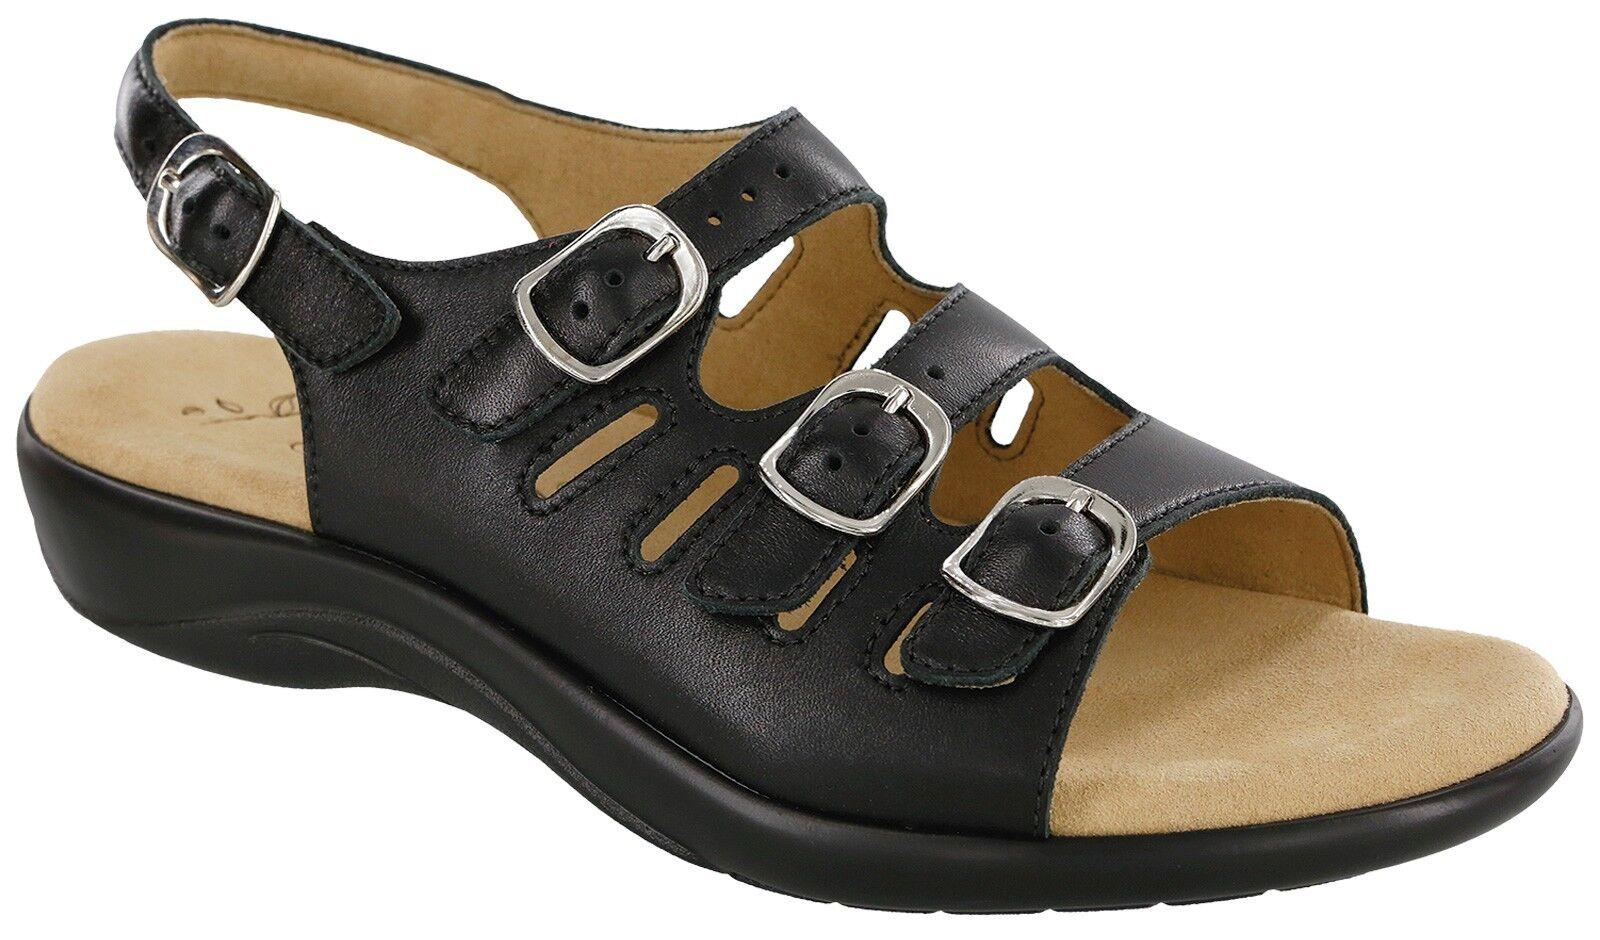 SAS MYSTIC Womens Black 3110 013 Leather Shoes Comfort Adjustable Strap Sandals Shoes Leather deca33